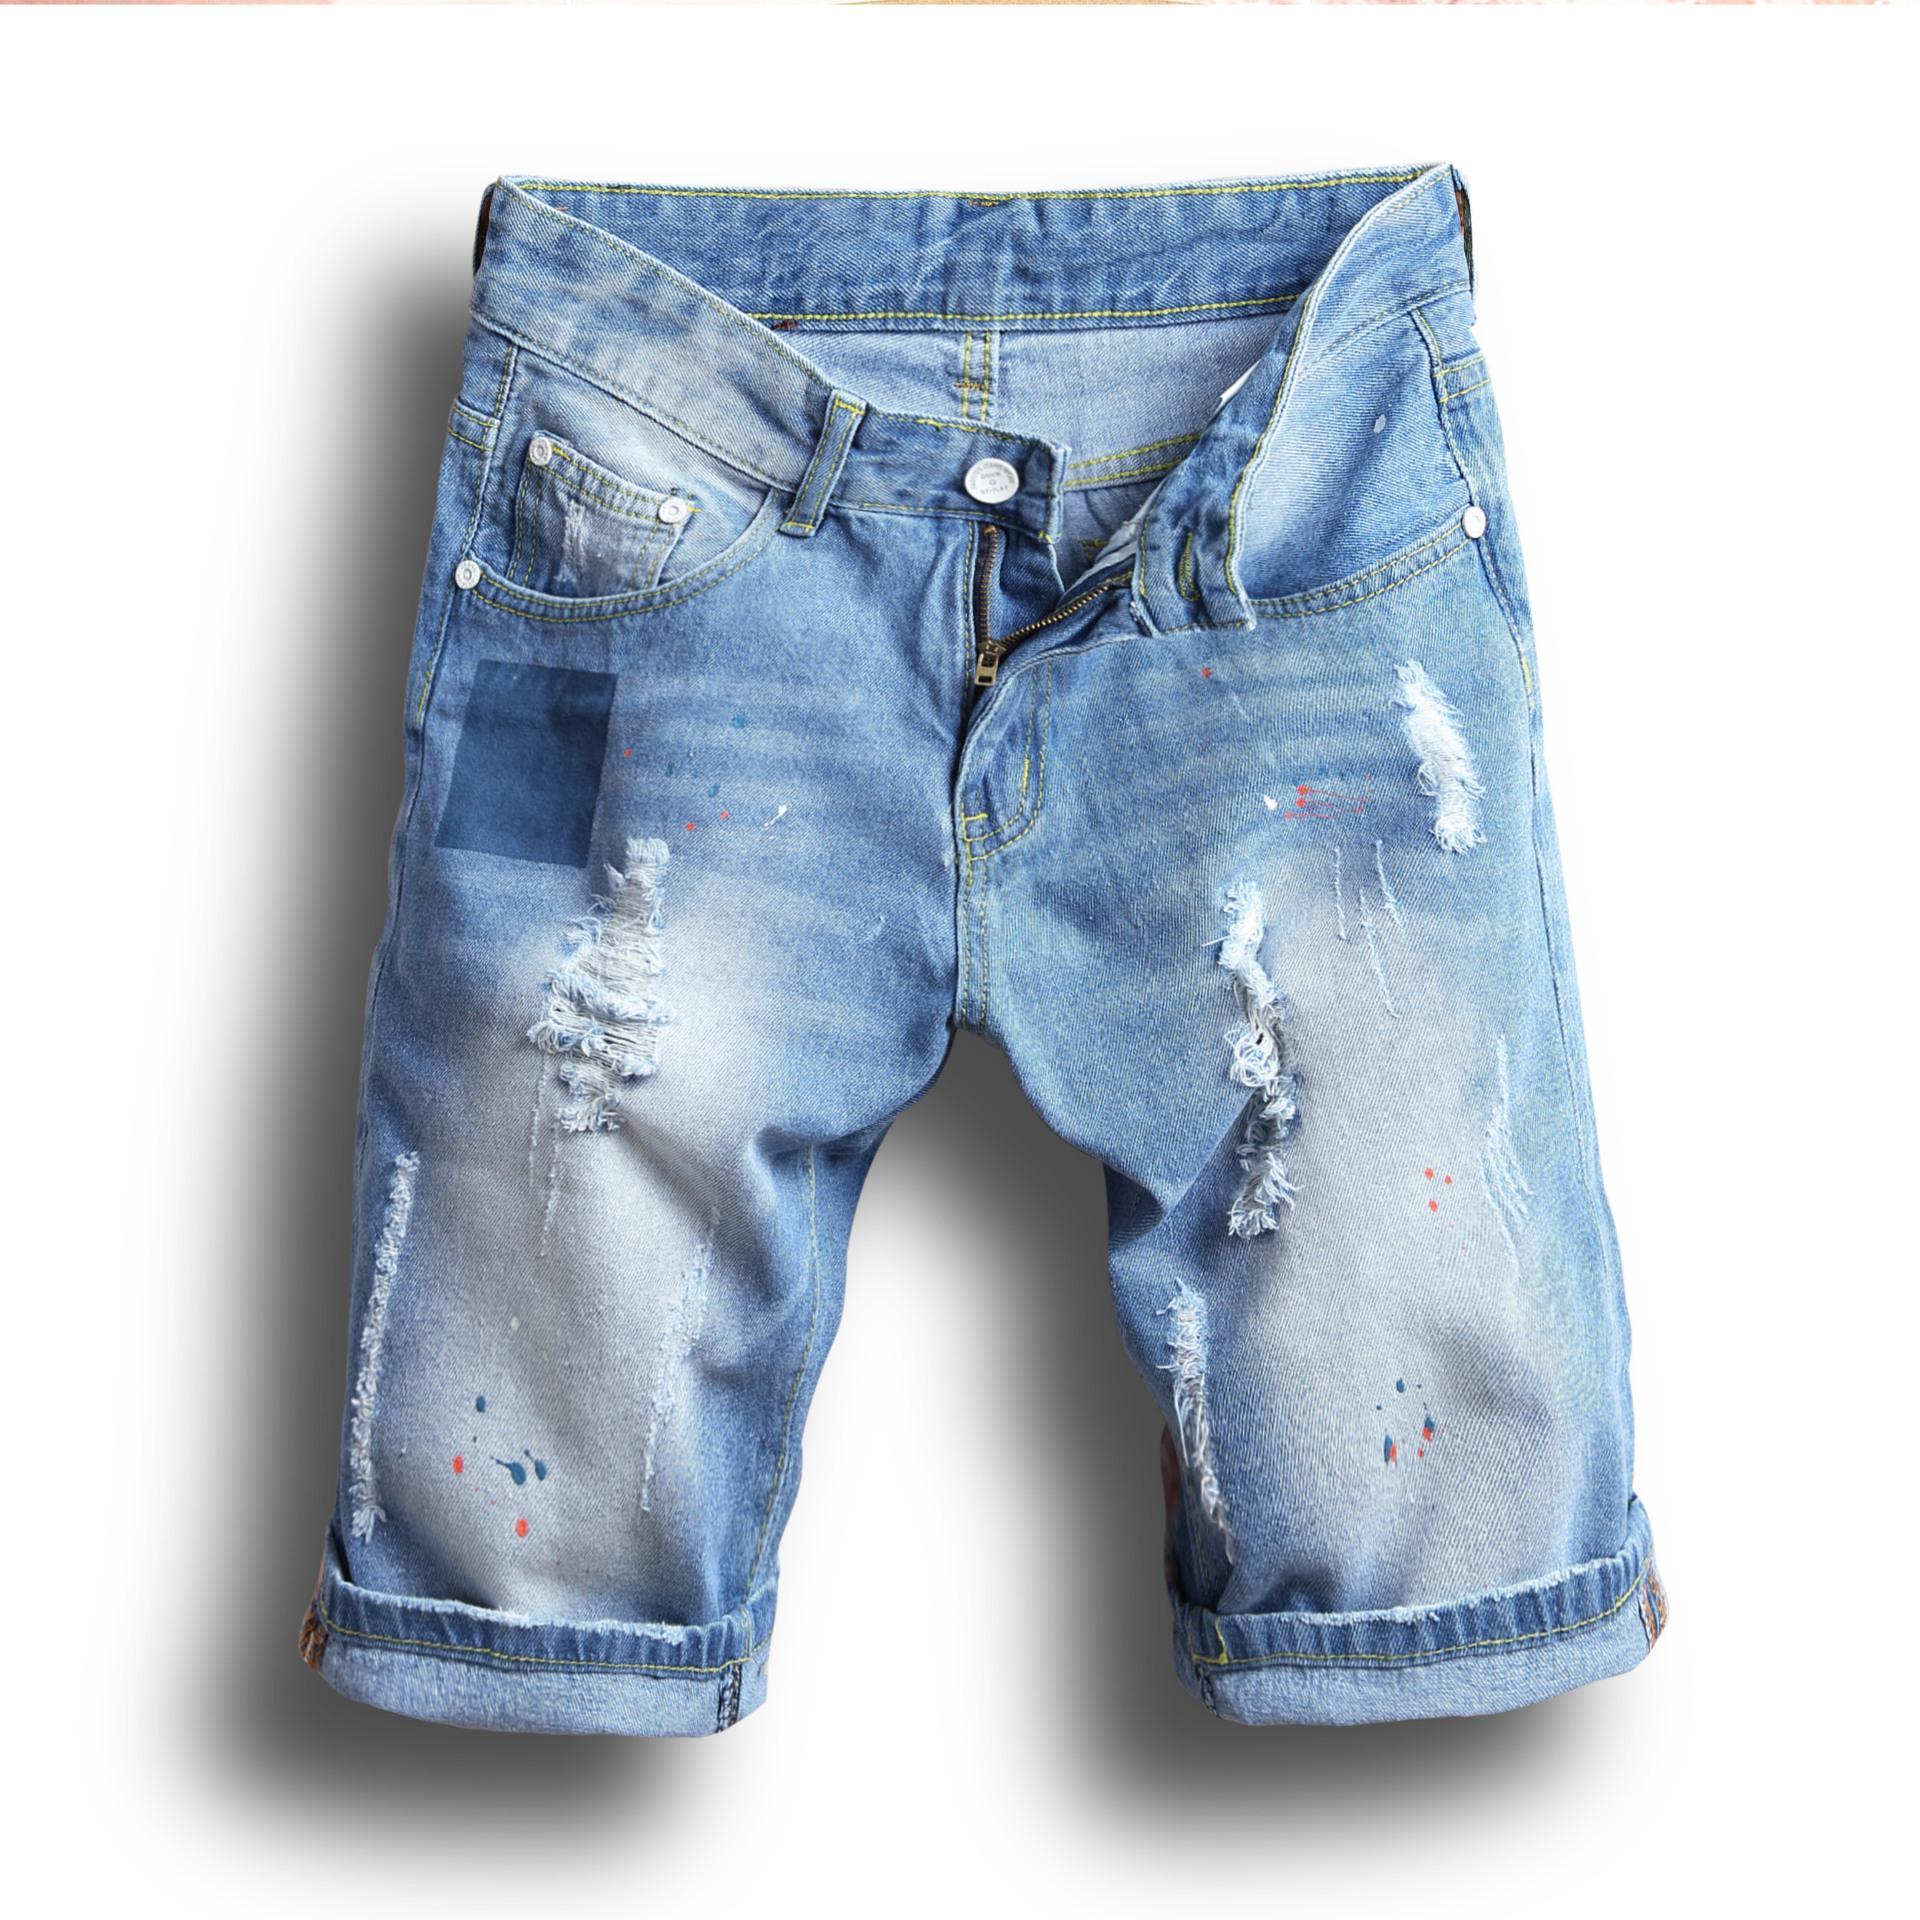 0e8d45d164 2019 Summer Denim Shorts Men Jeans Mens Jean Shorts Hole Hip Hop Bermuda  Male Jogger Short Jeans From Johnbob1994, $18.79 | DHgate.Com